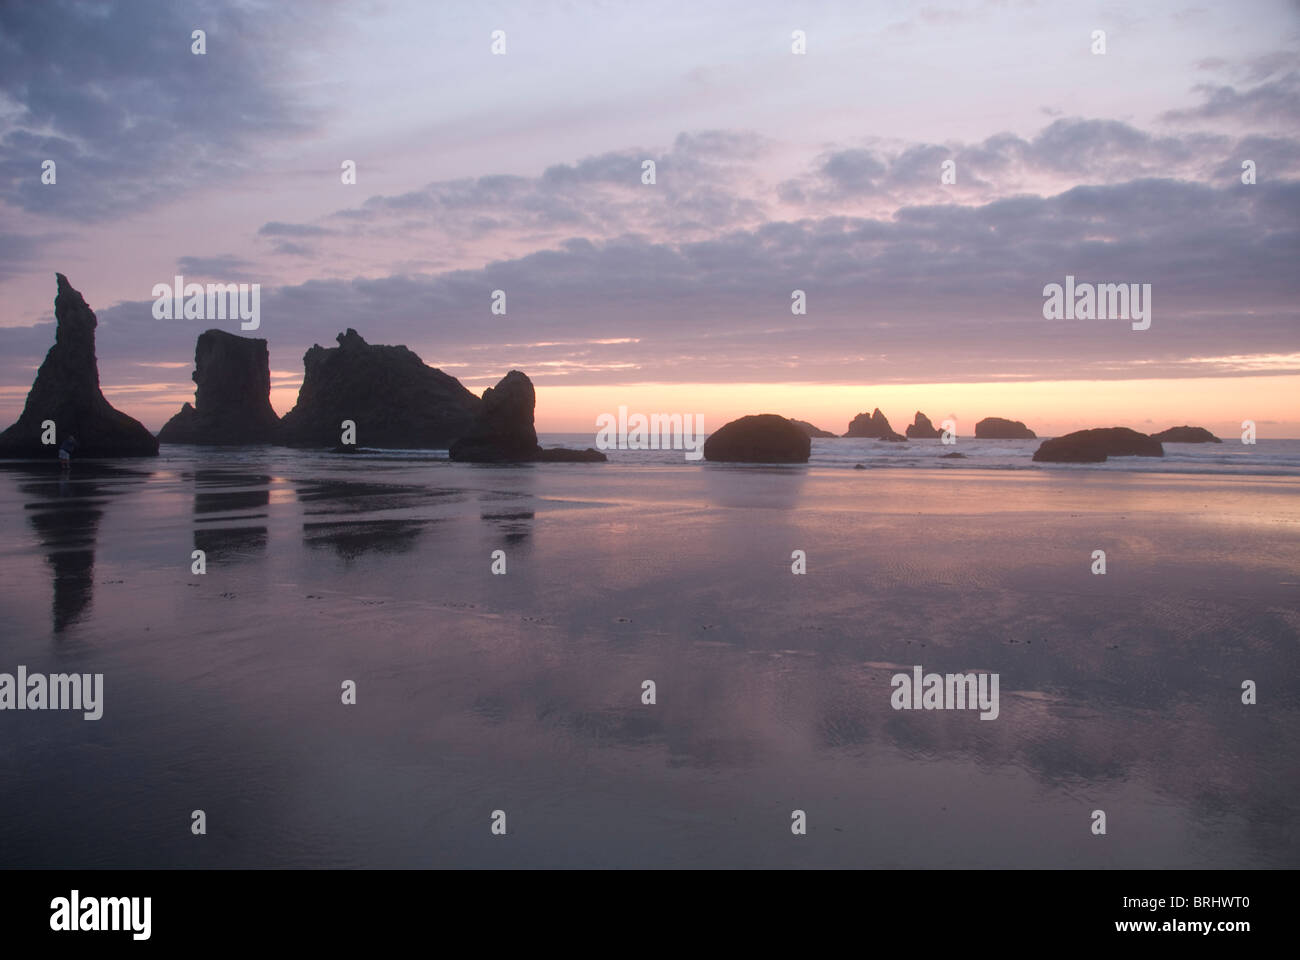 Sea stacks in the Pacific Ocean at Bandon State Park Bandon Oregon - Stock Image